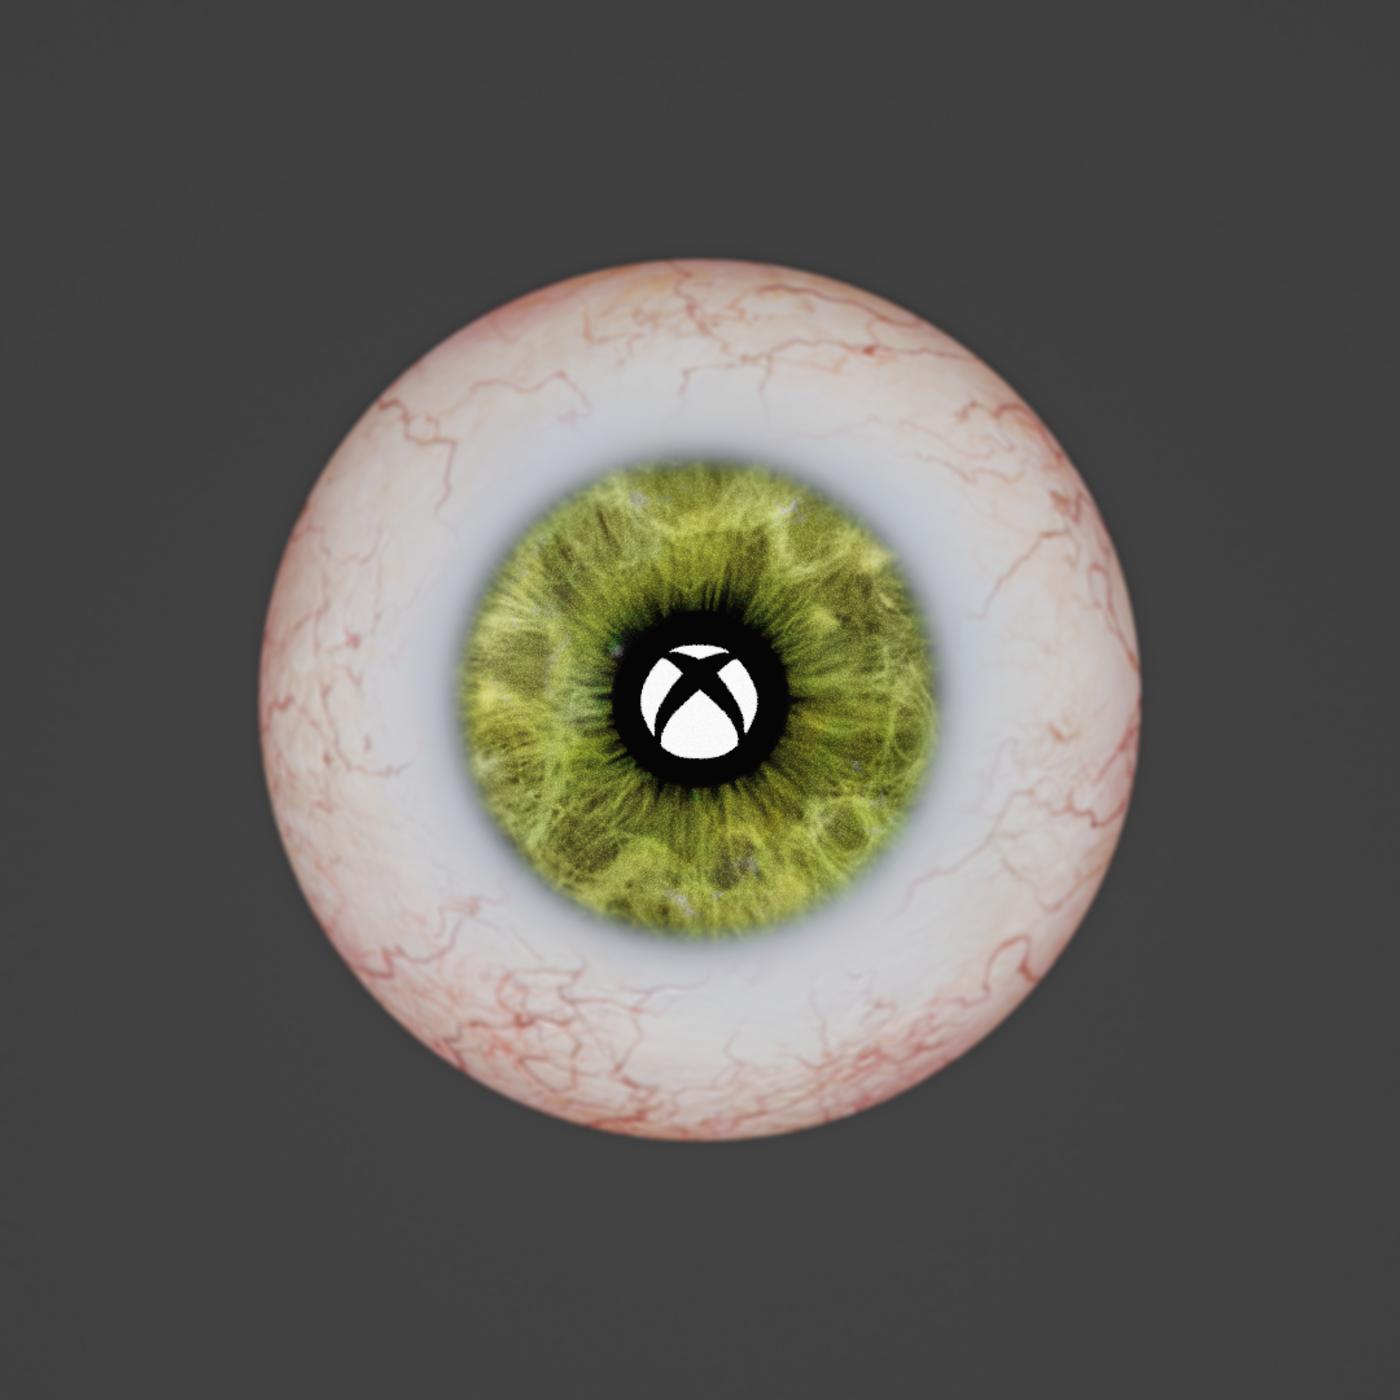 Eye ball with Xbox logo reflection